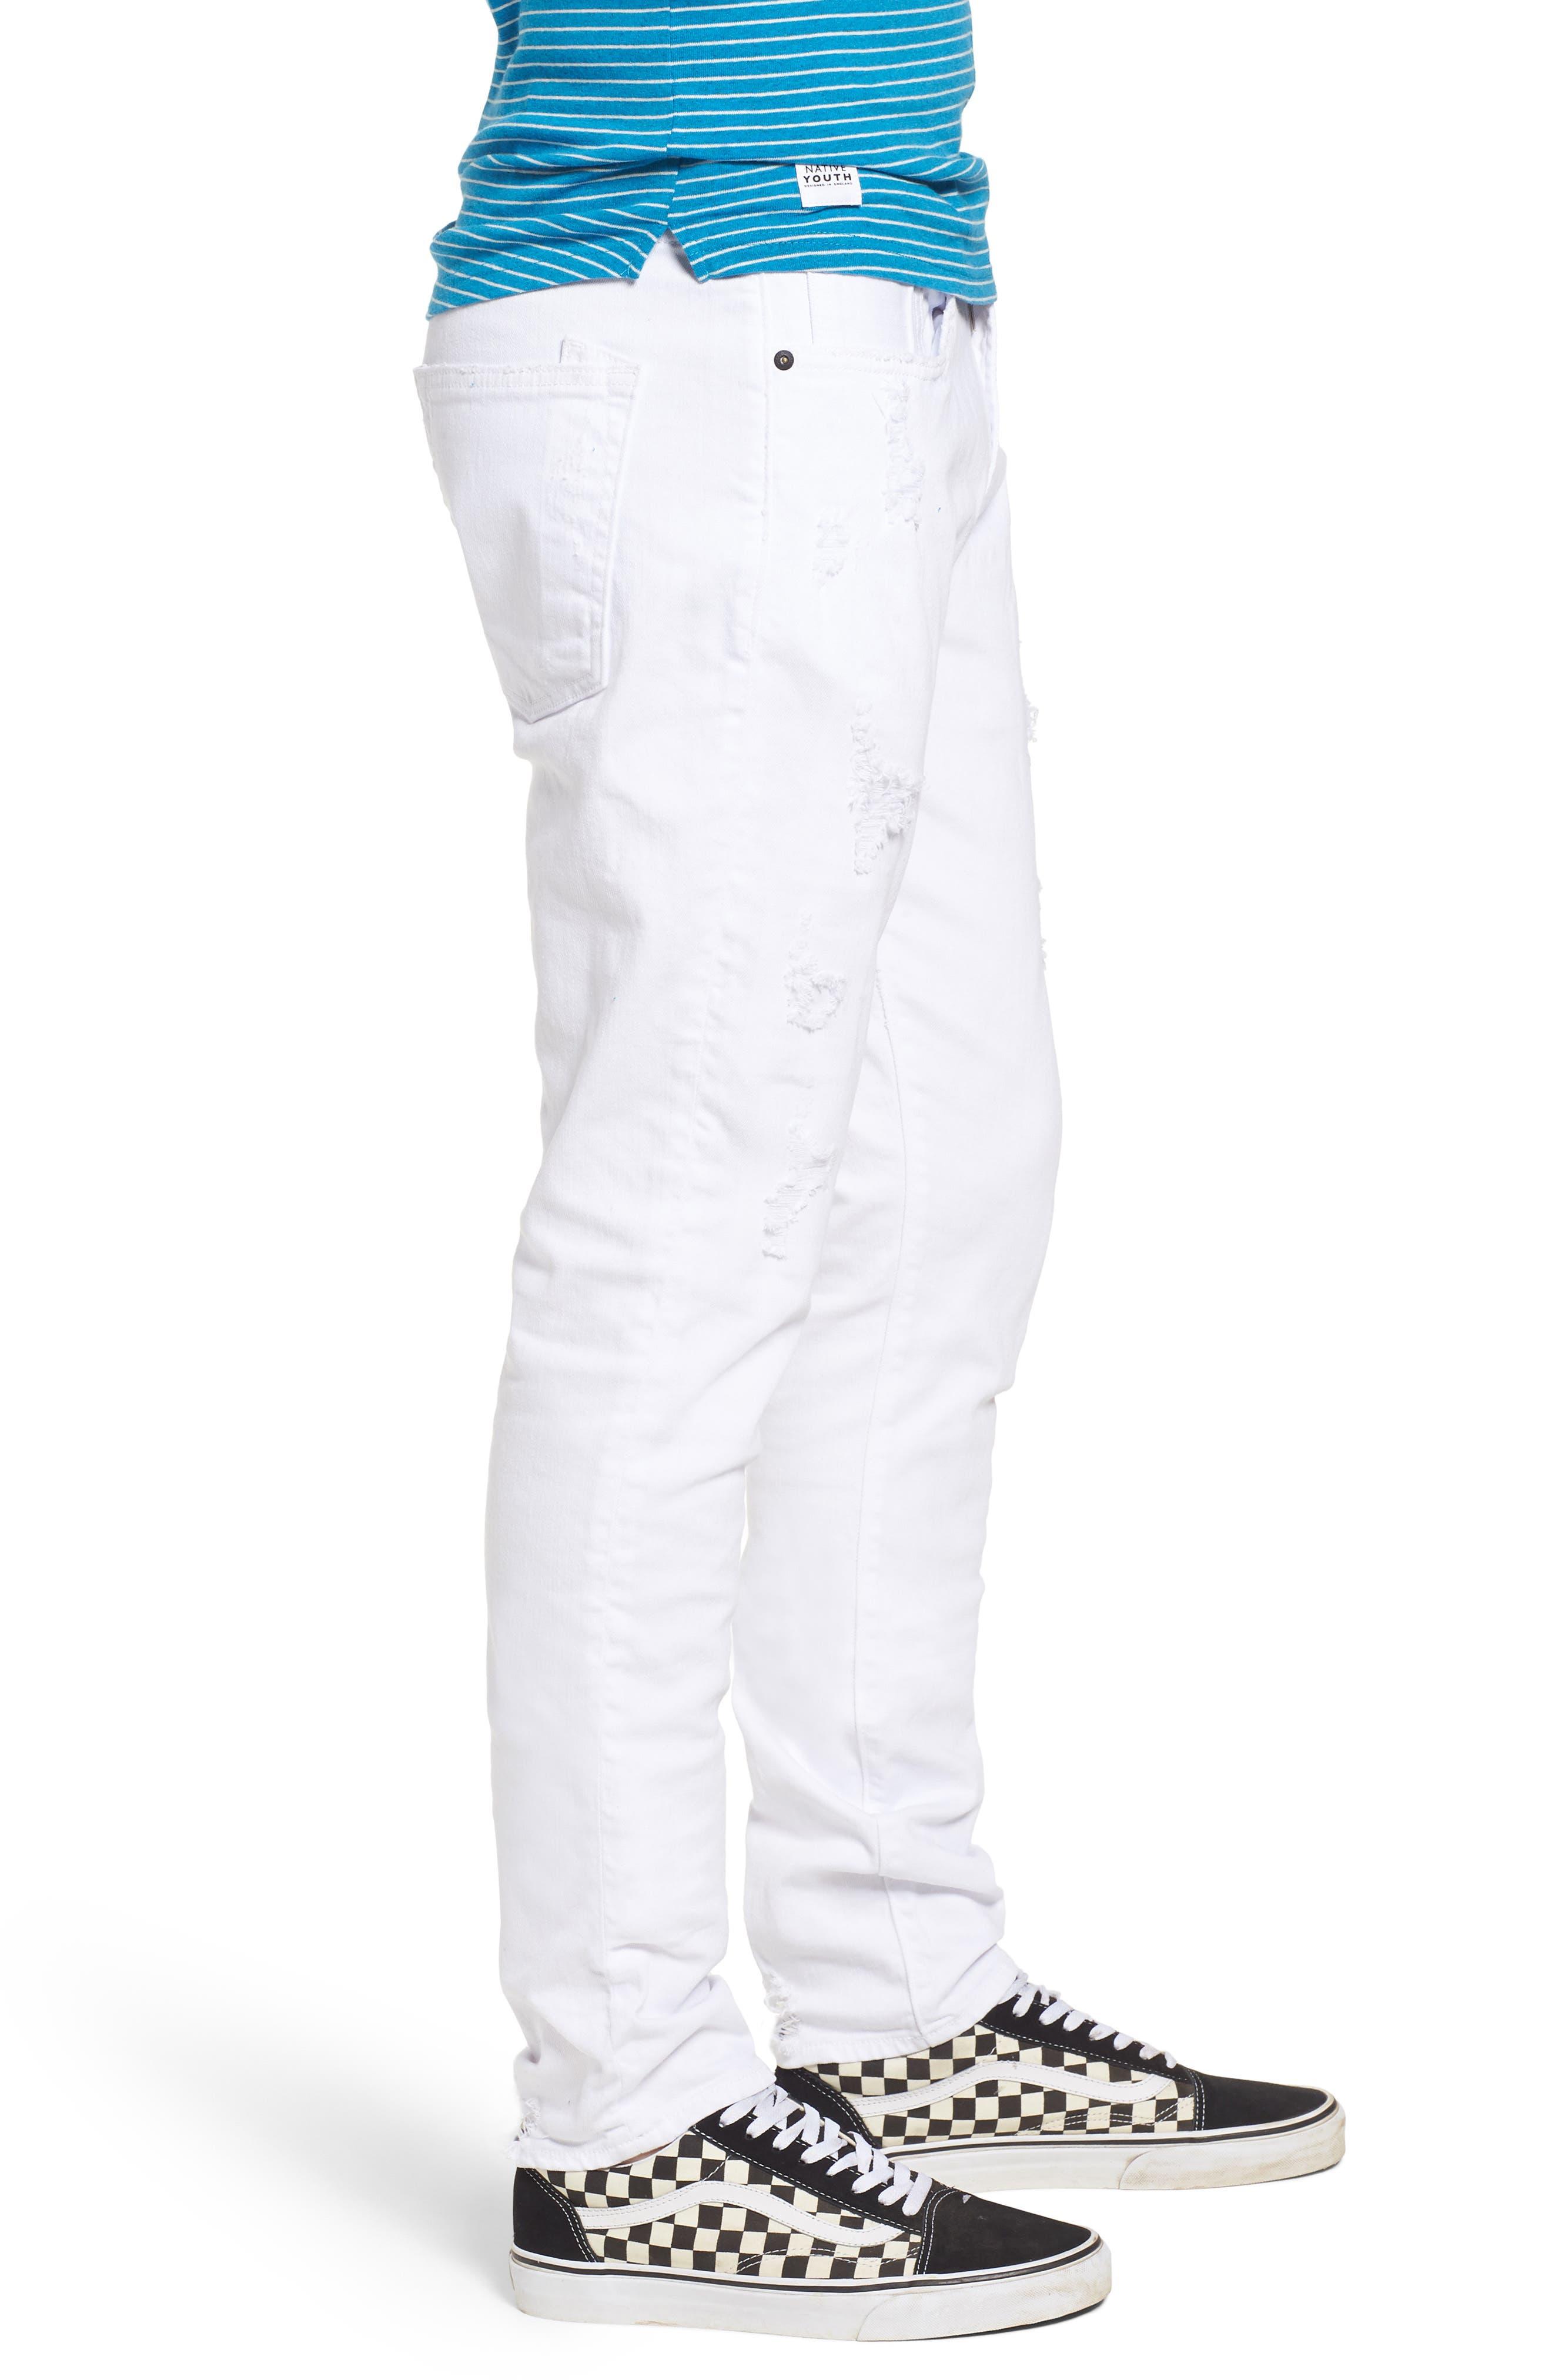 Windsor Slim Fit Jeans,                             Alternate thumbnail 3, color,                             100